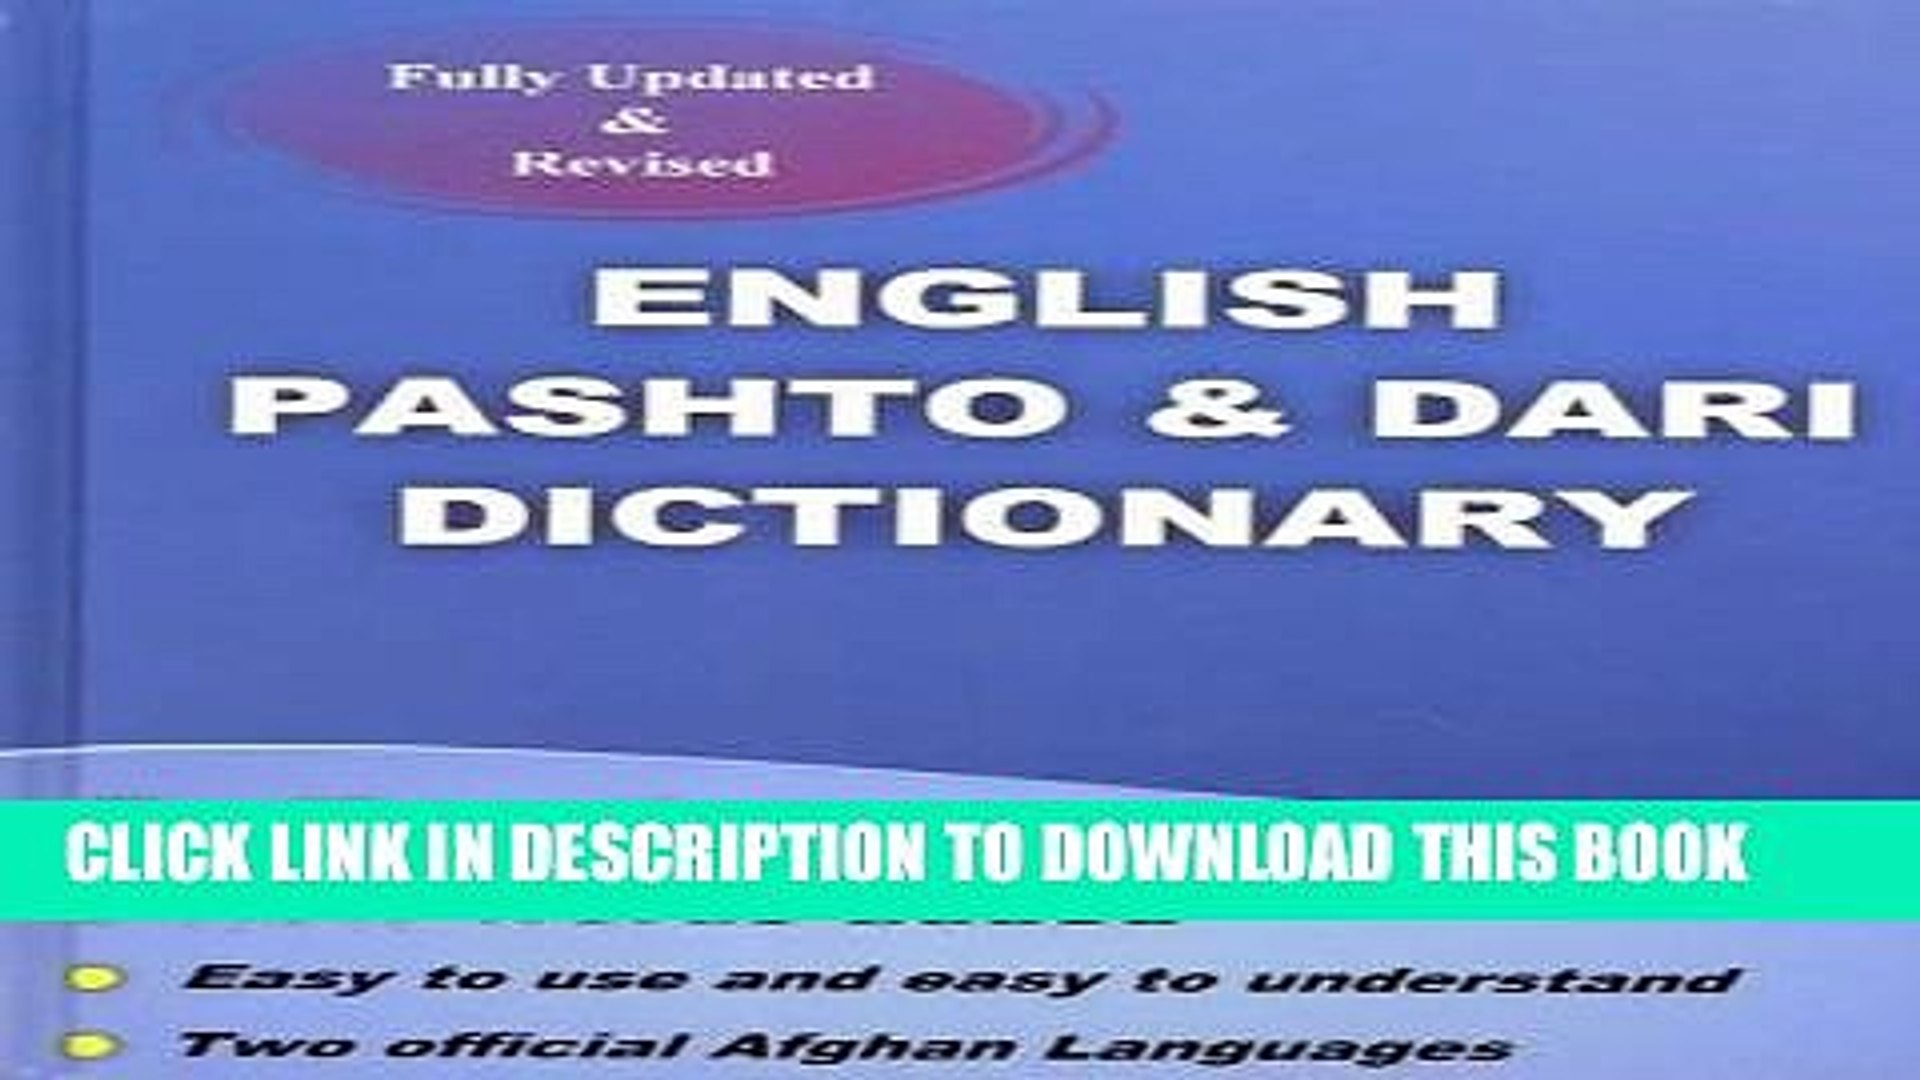 [Read] PDF English Pashto Dari Dictionary New Reales